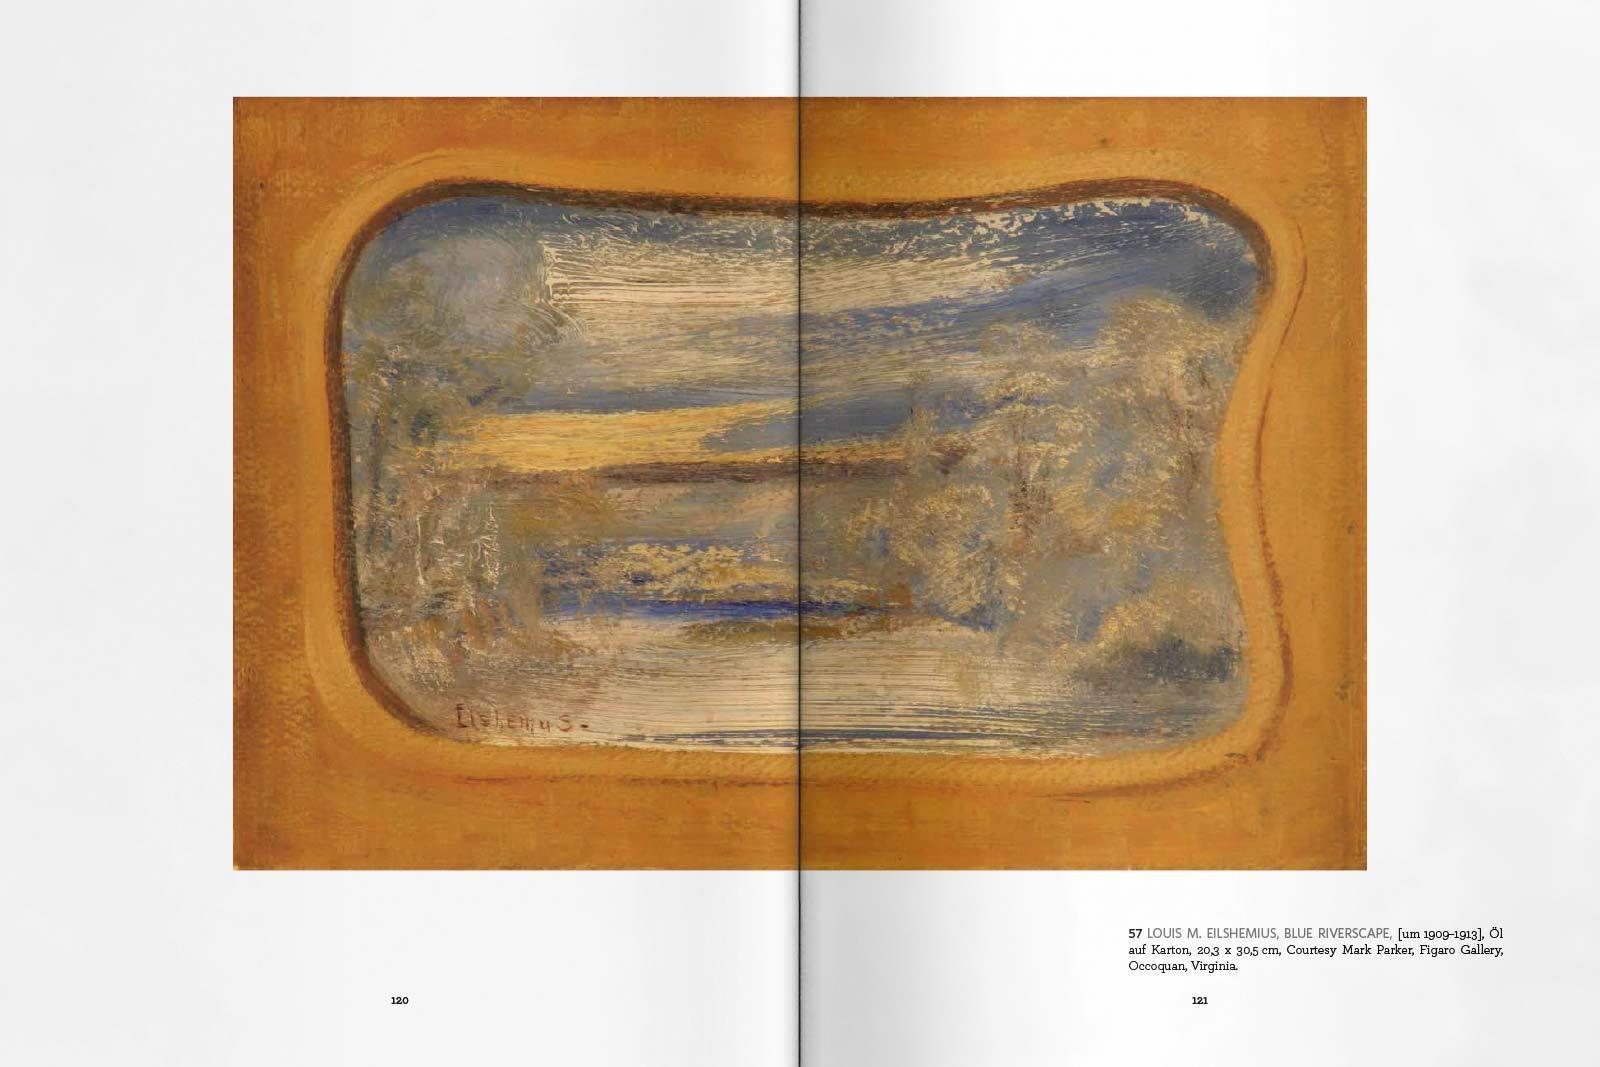 Louis Michel Eilshemius spread08